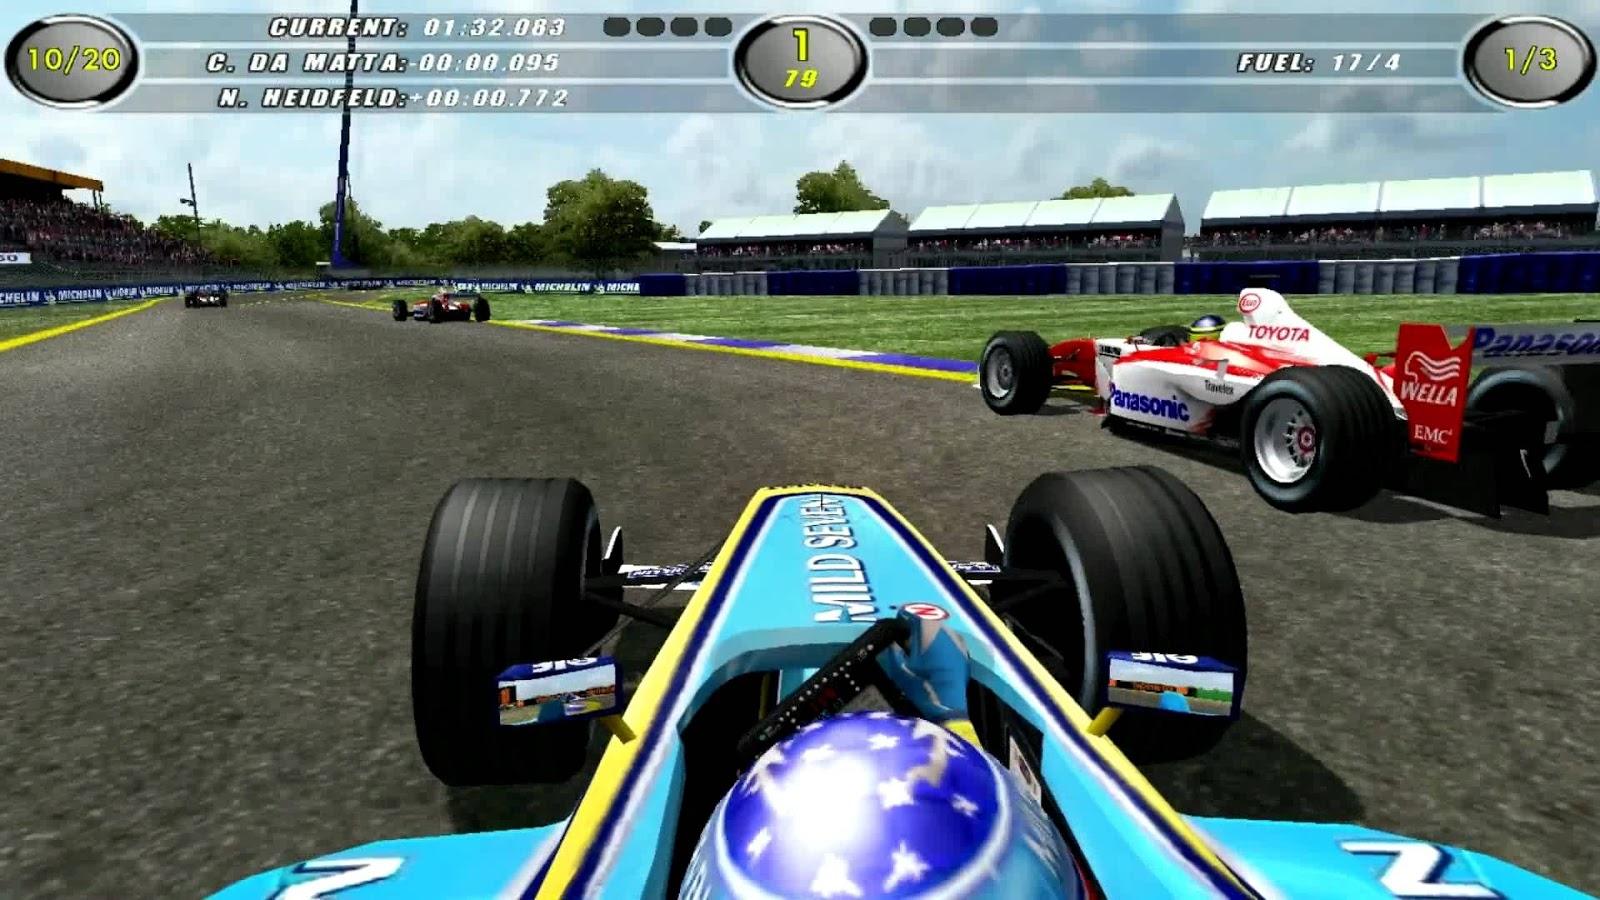 F1 challenge 99-02 1998 mod + download link youtube.